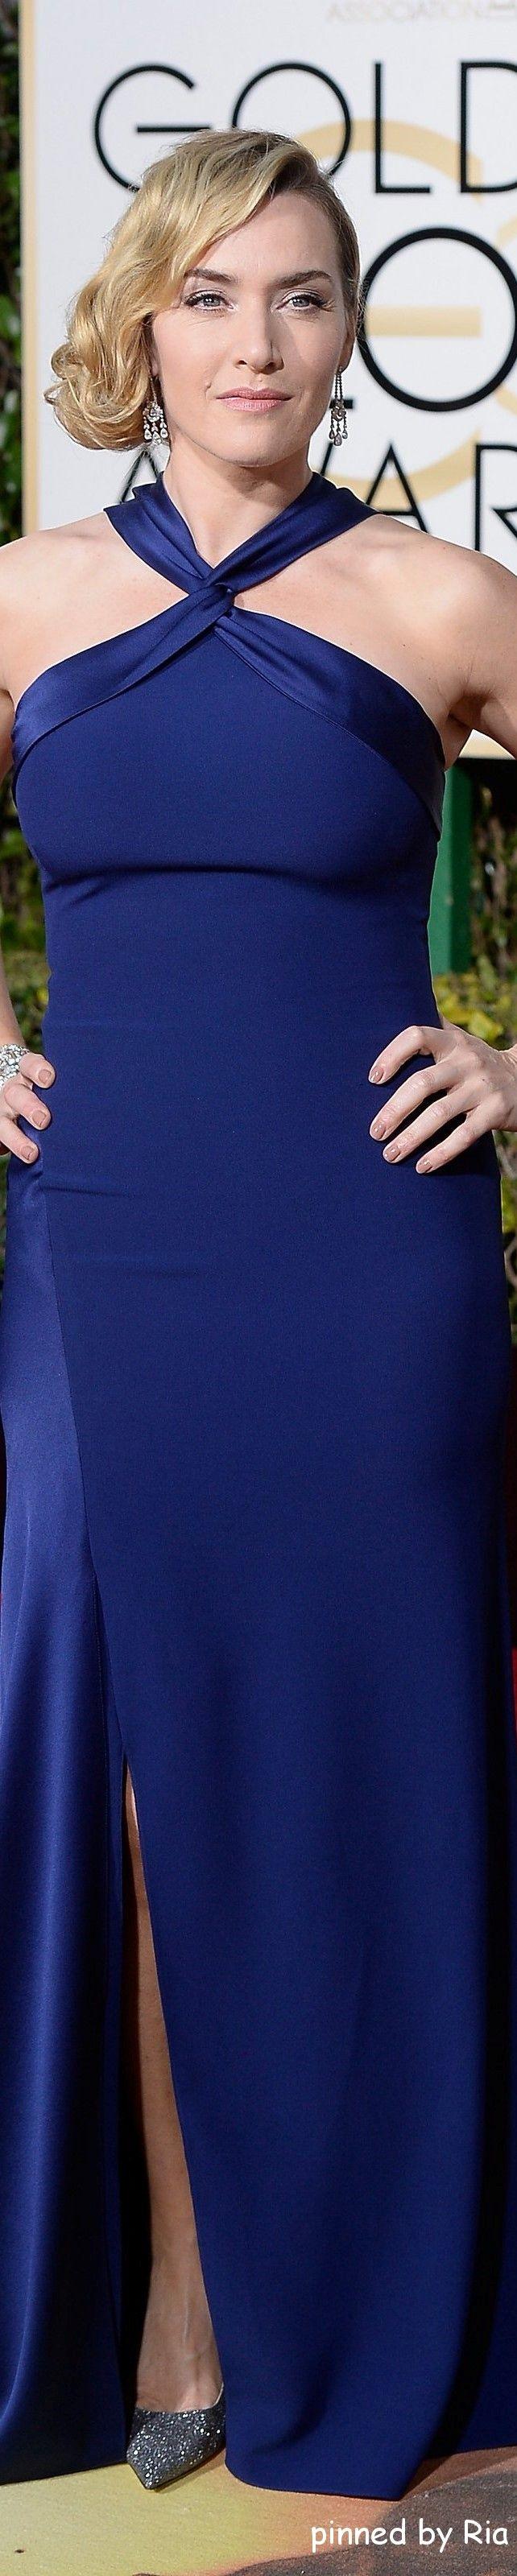 Kate Winslet in Ralph Lauren l Golden Globe Awards 2016 l Ria